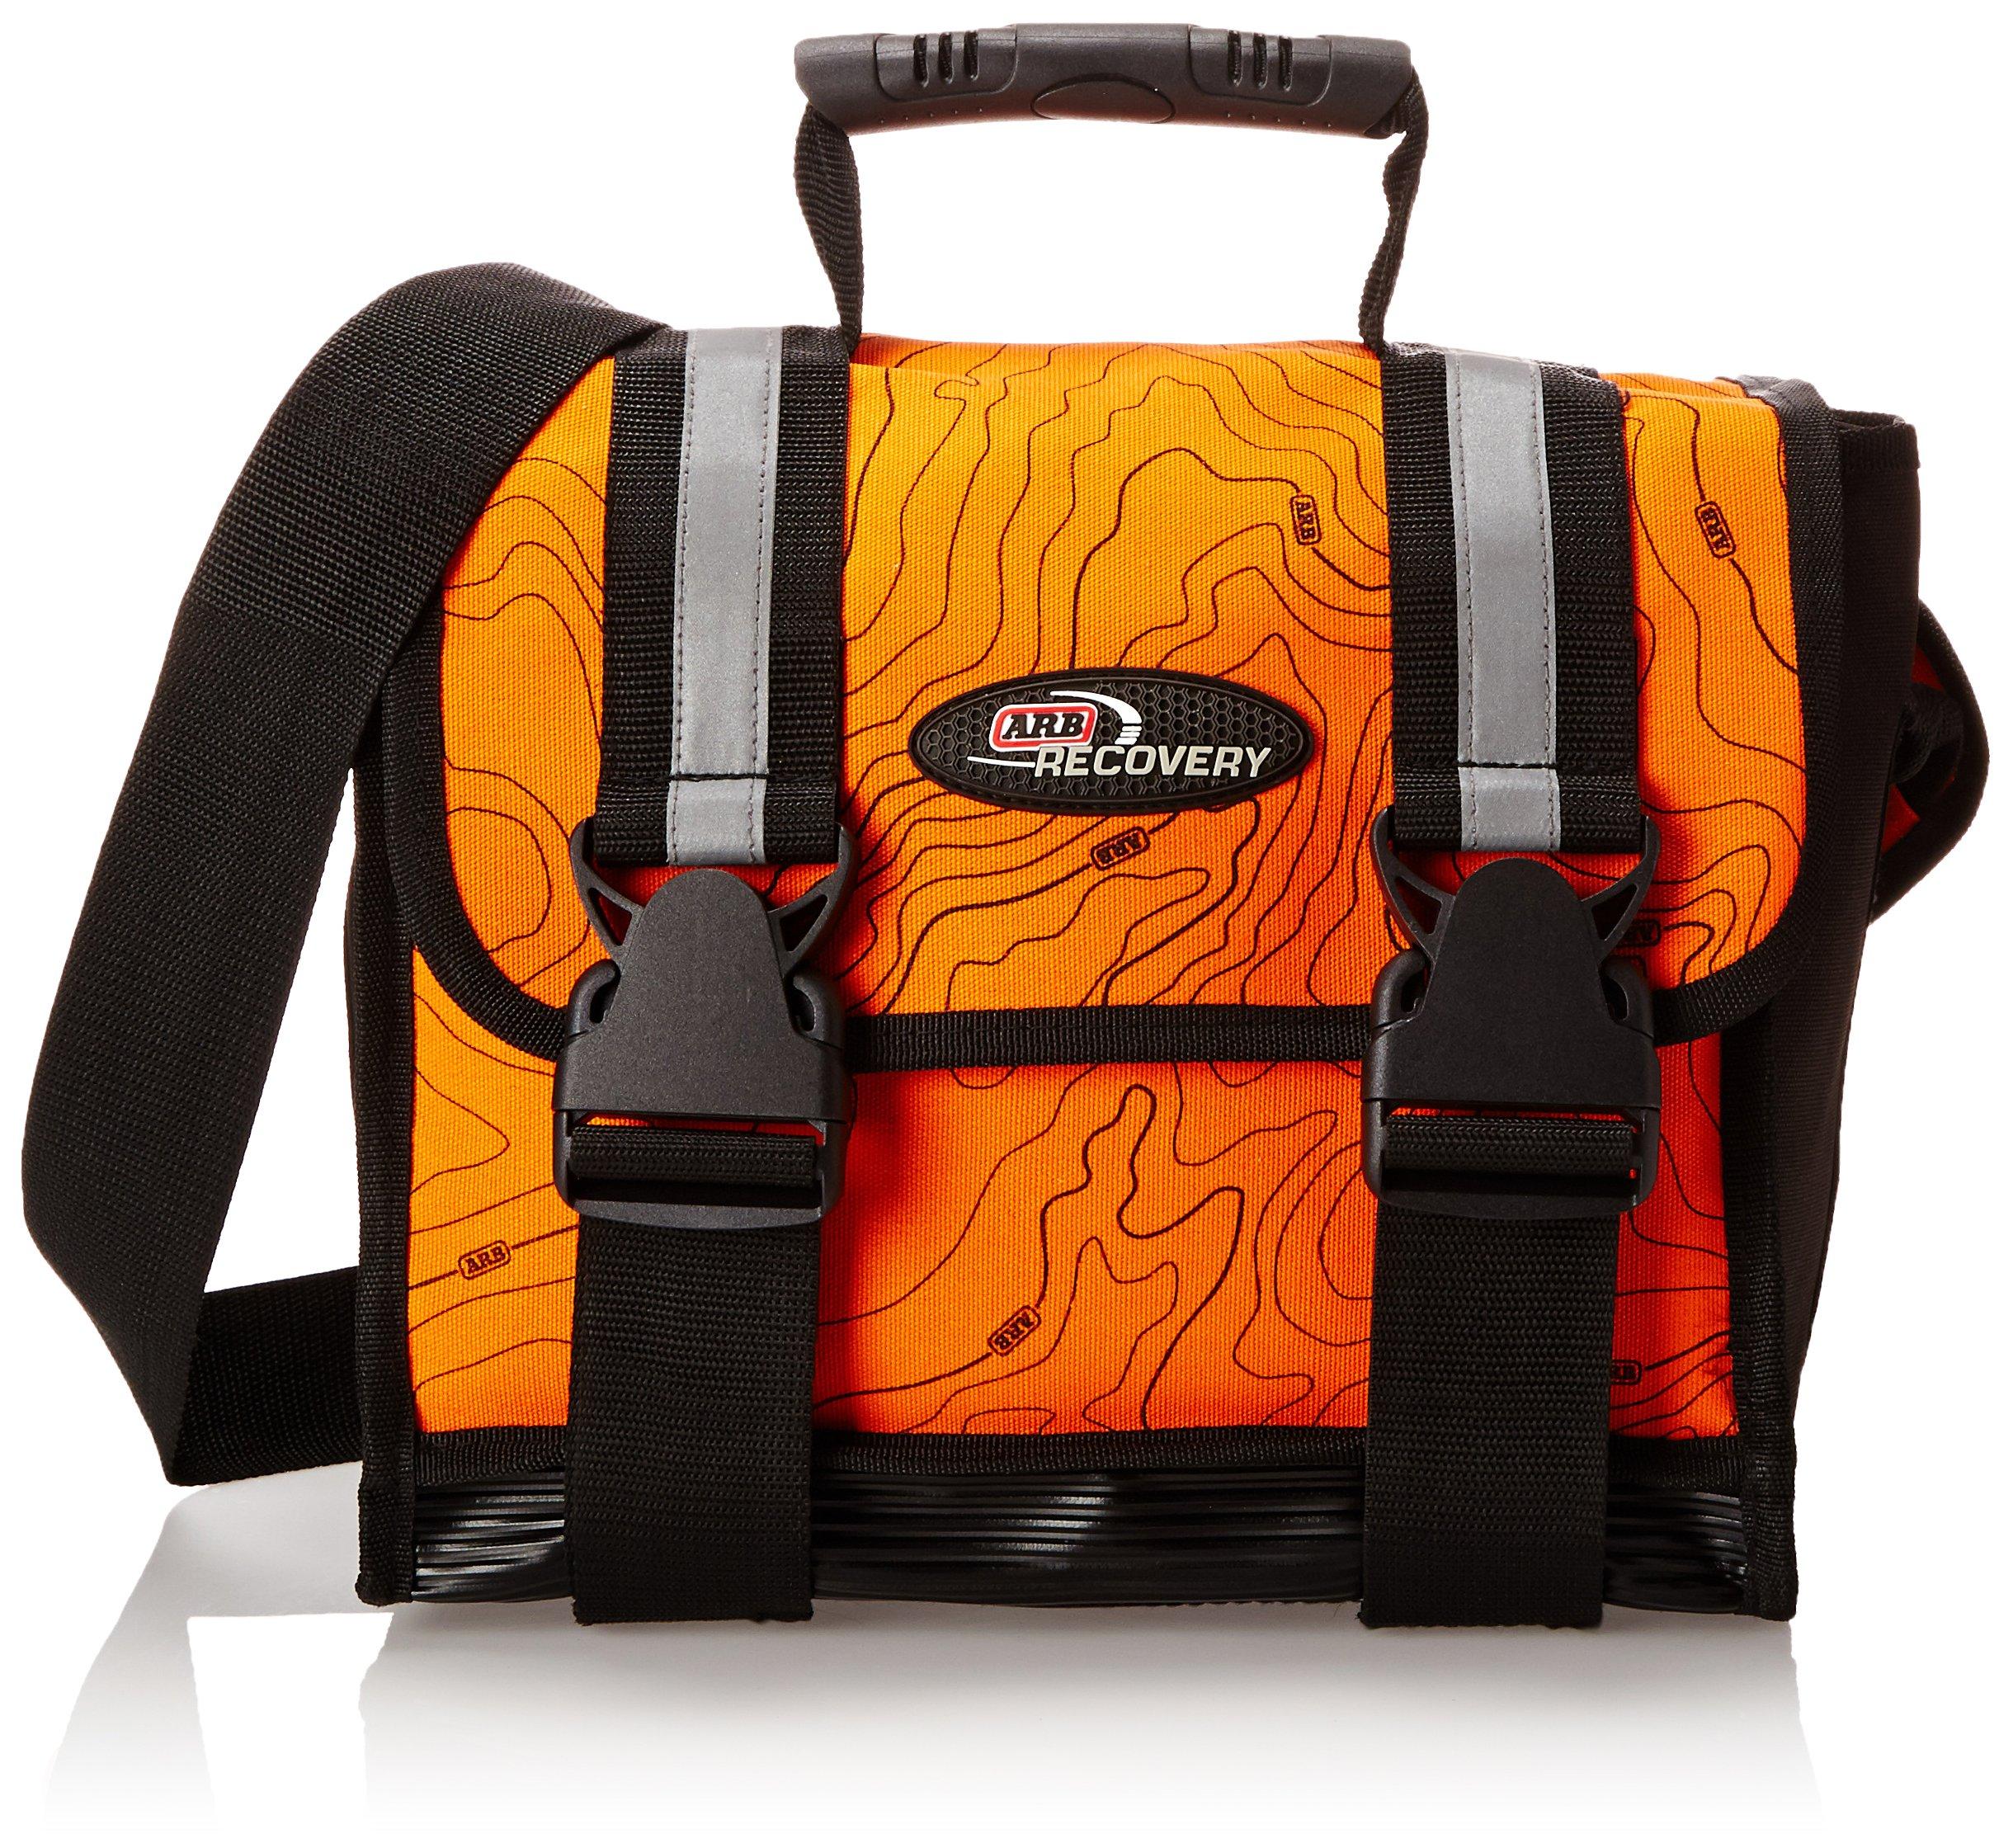 ARB ARB502 Orange Small Recovery Bag by ARB (Image #6)